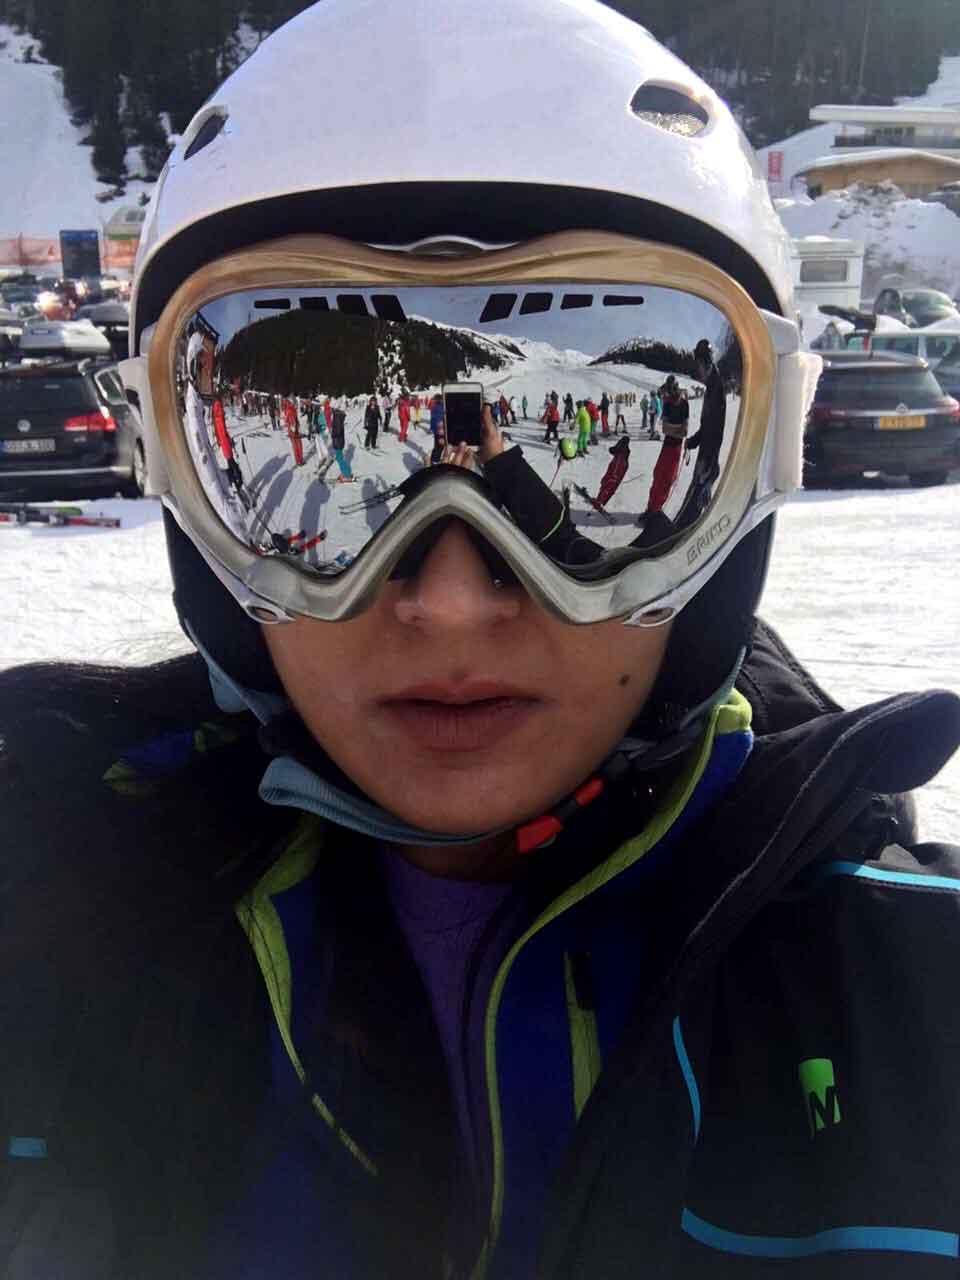 Ruchi in her ski gear, Zillertal, Austria. Image©gunjanvirk